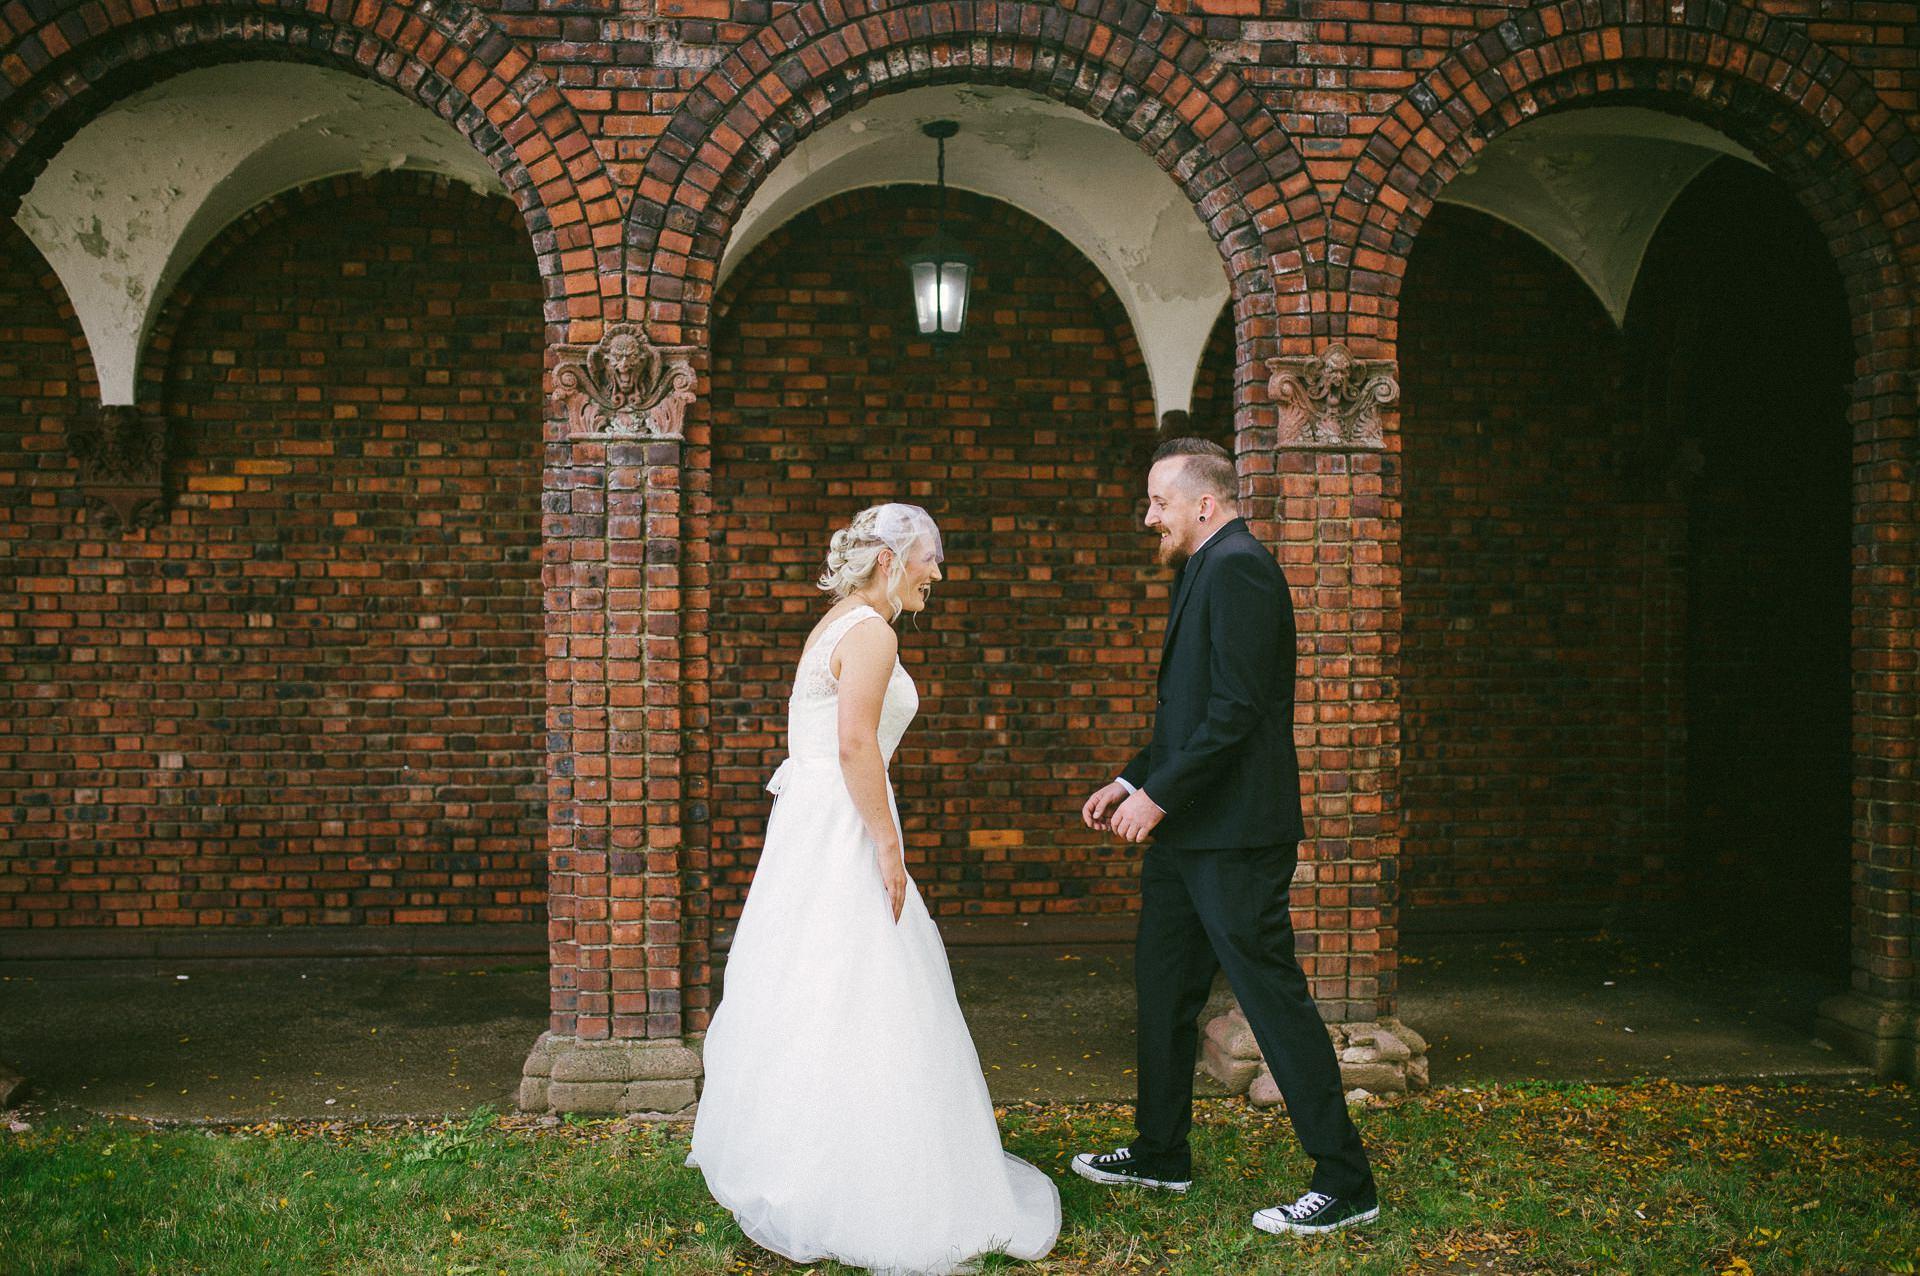 Goldhorn Brewery Wedding Photos in Cleveland 1 29.jpg